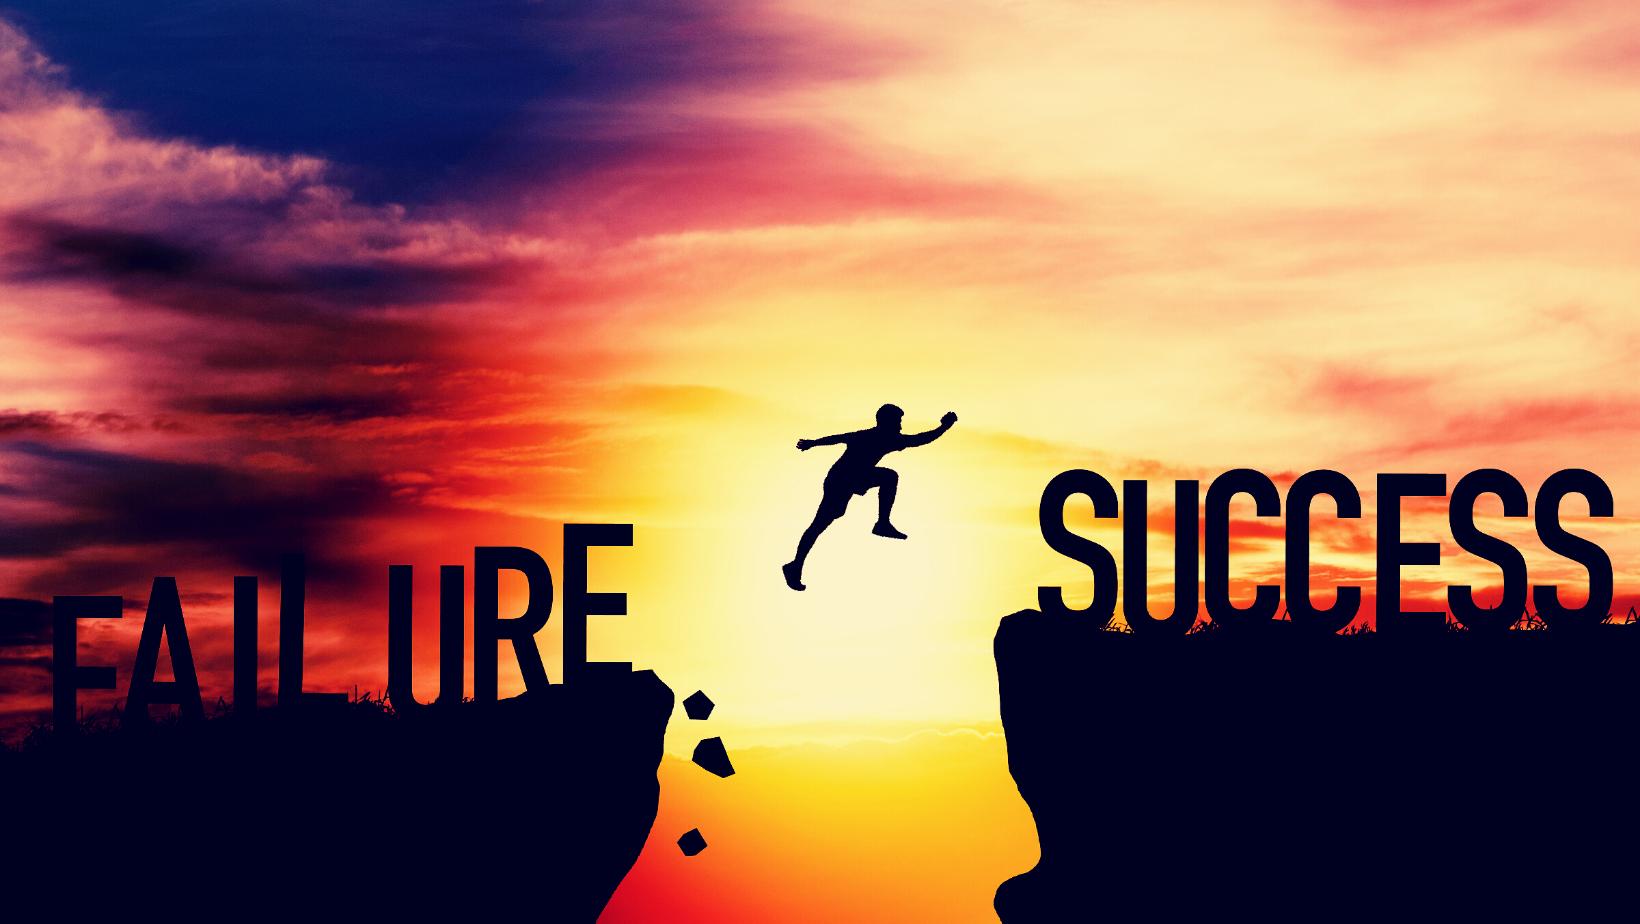 Failure to Fortune